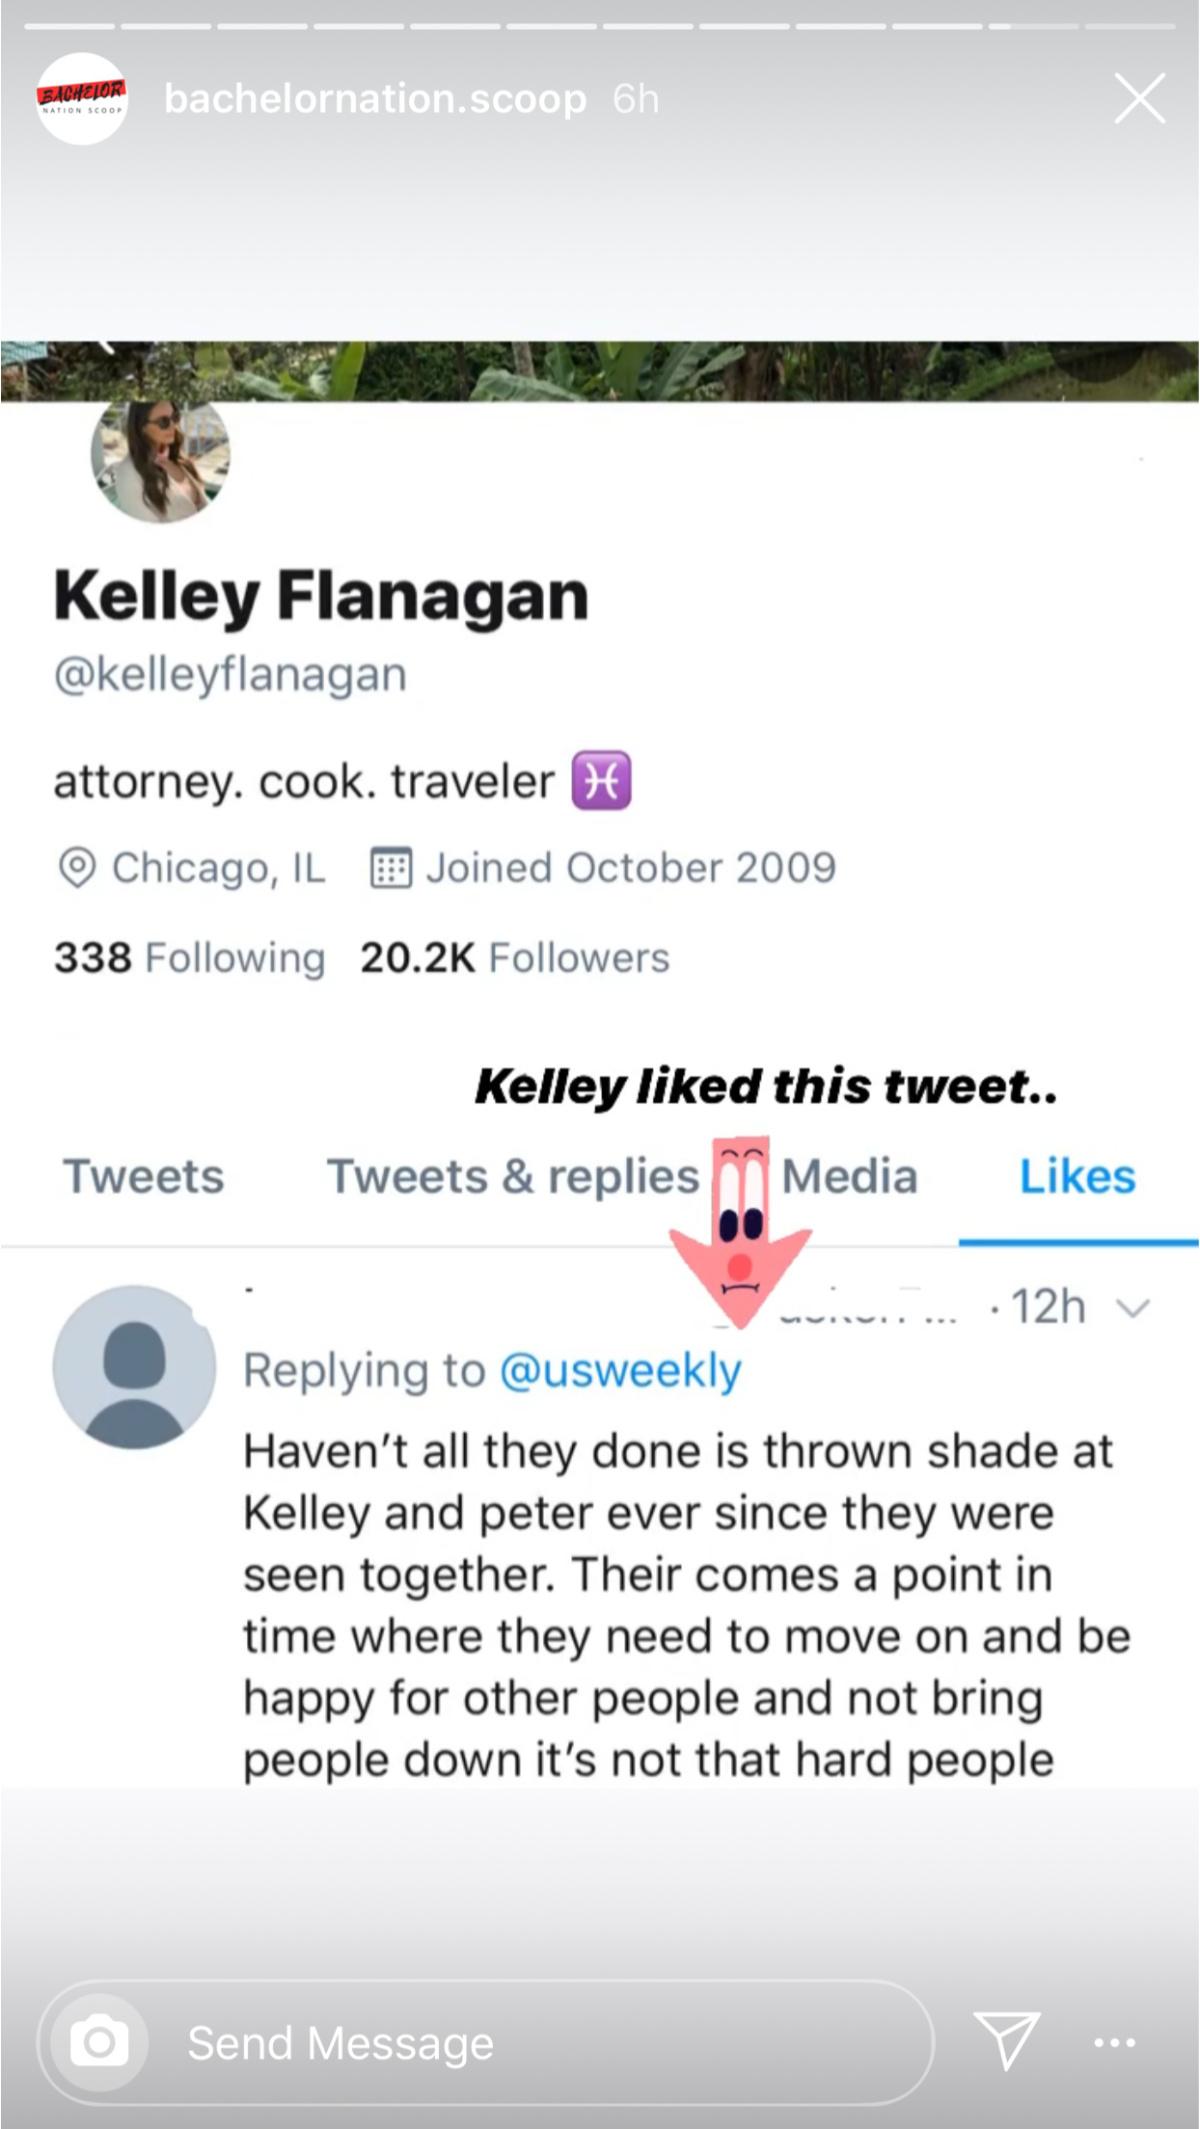 Kelley Flanagan